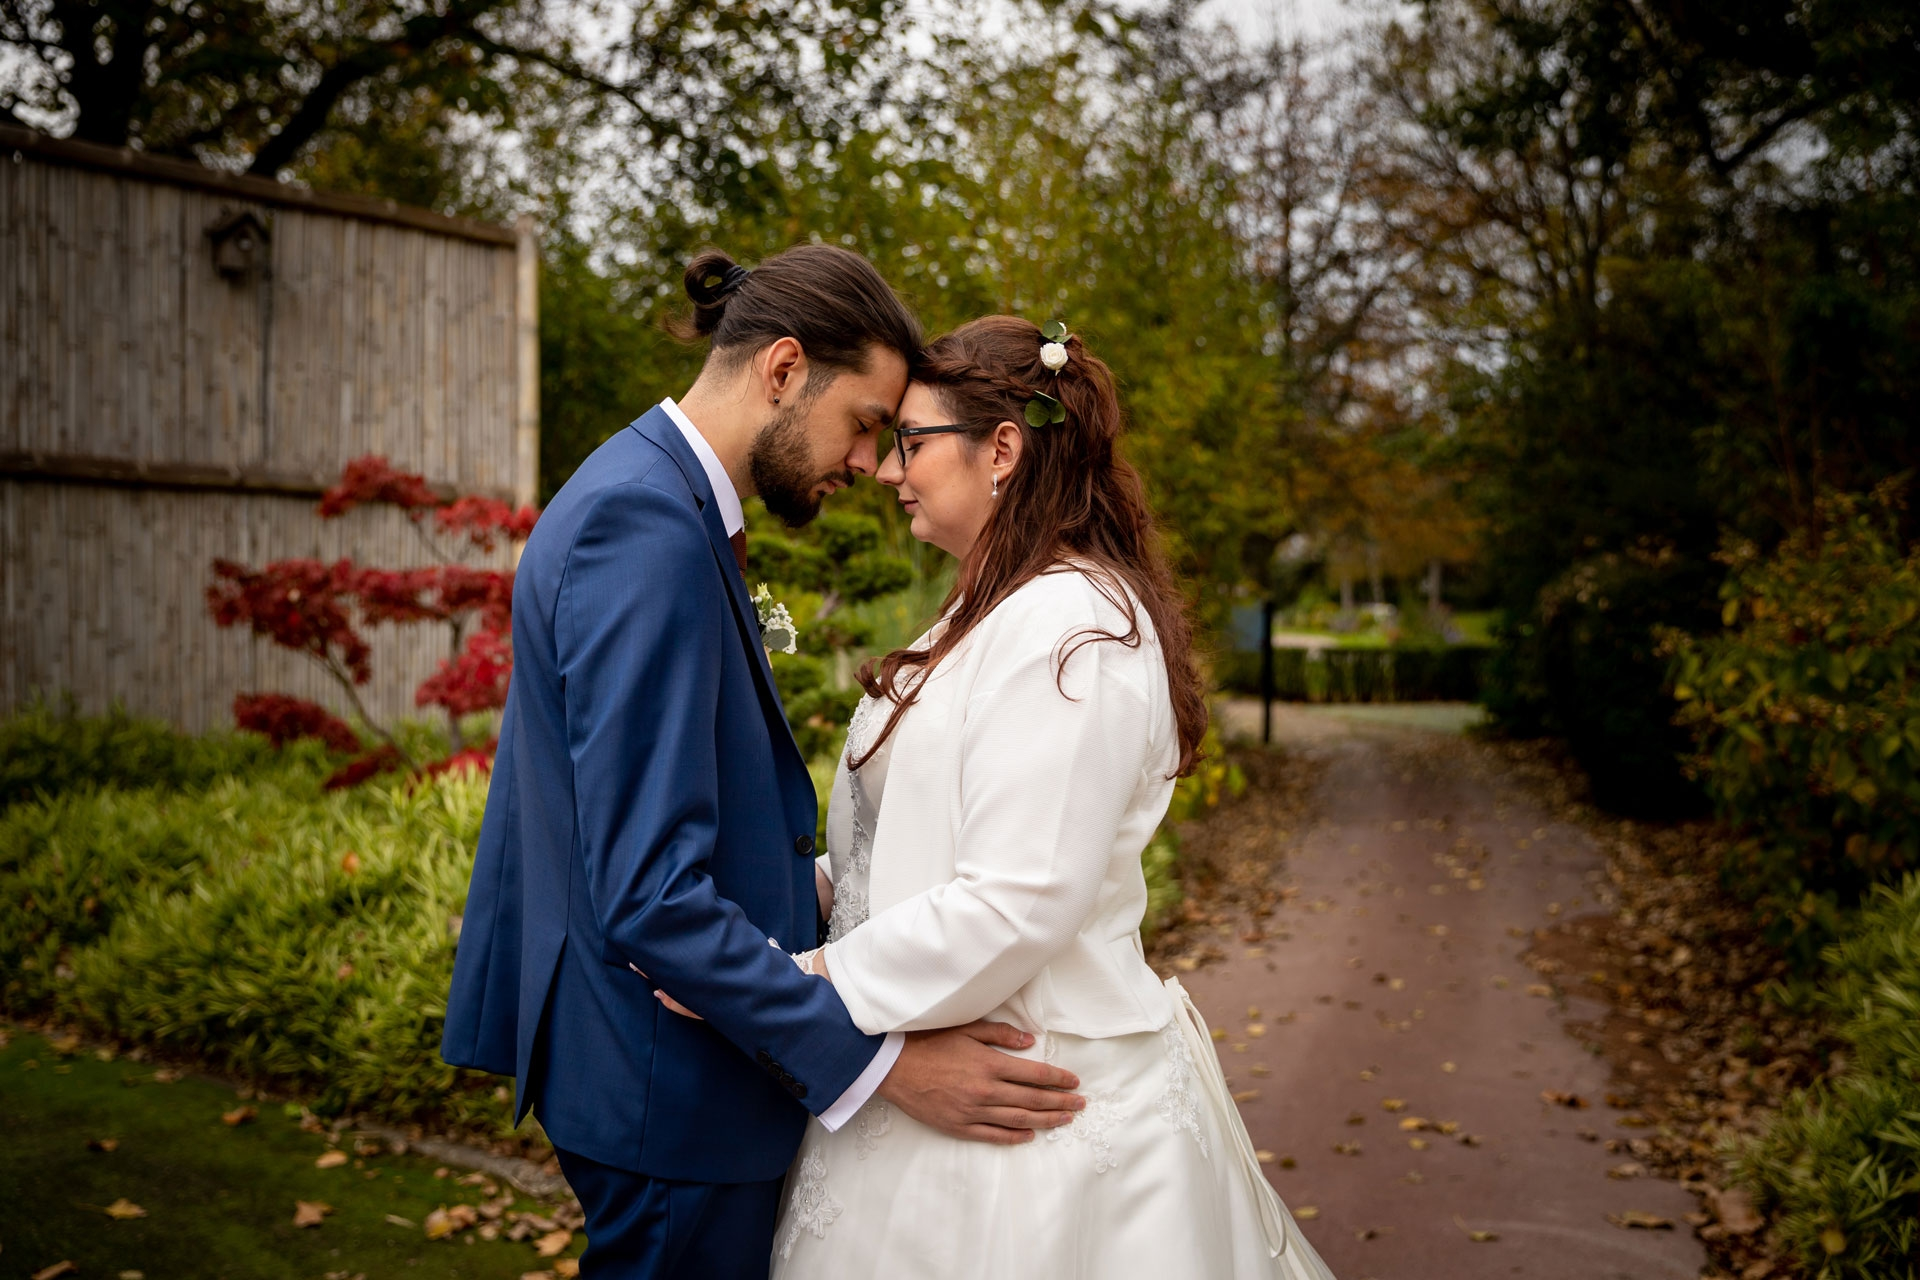 20201017-mariage-justine-alexandre-46